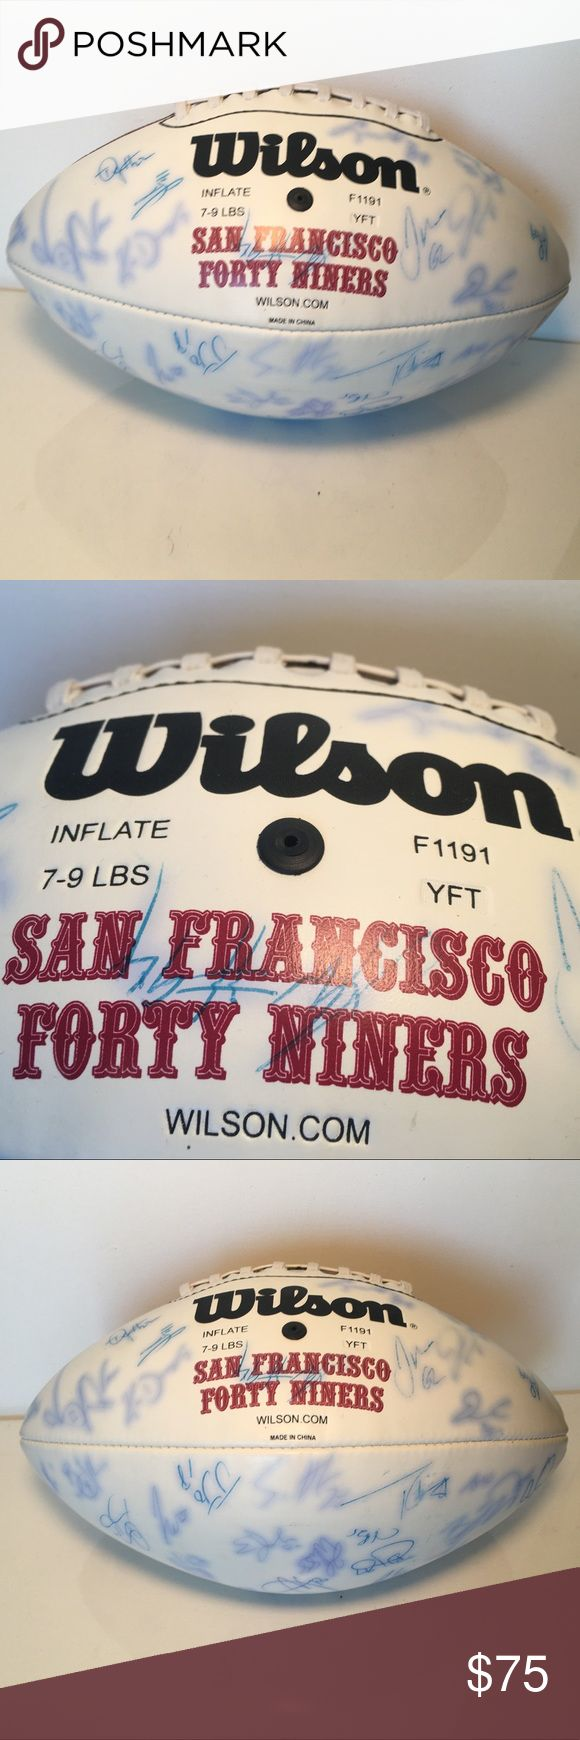 2003 SF 49ers Autographed Wilson NFL Football 2003 San Francisco 49ers Autographed Wilson *OFFICIAL* NFL Football. Wilson Other